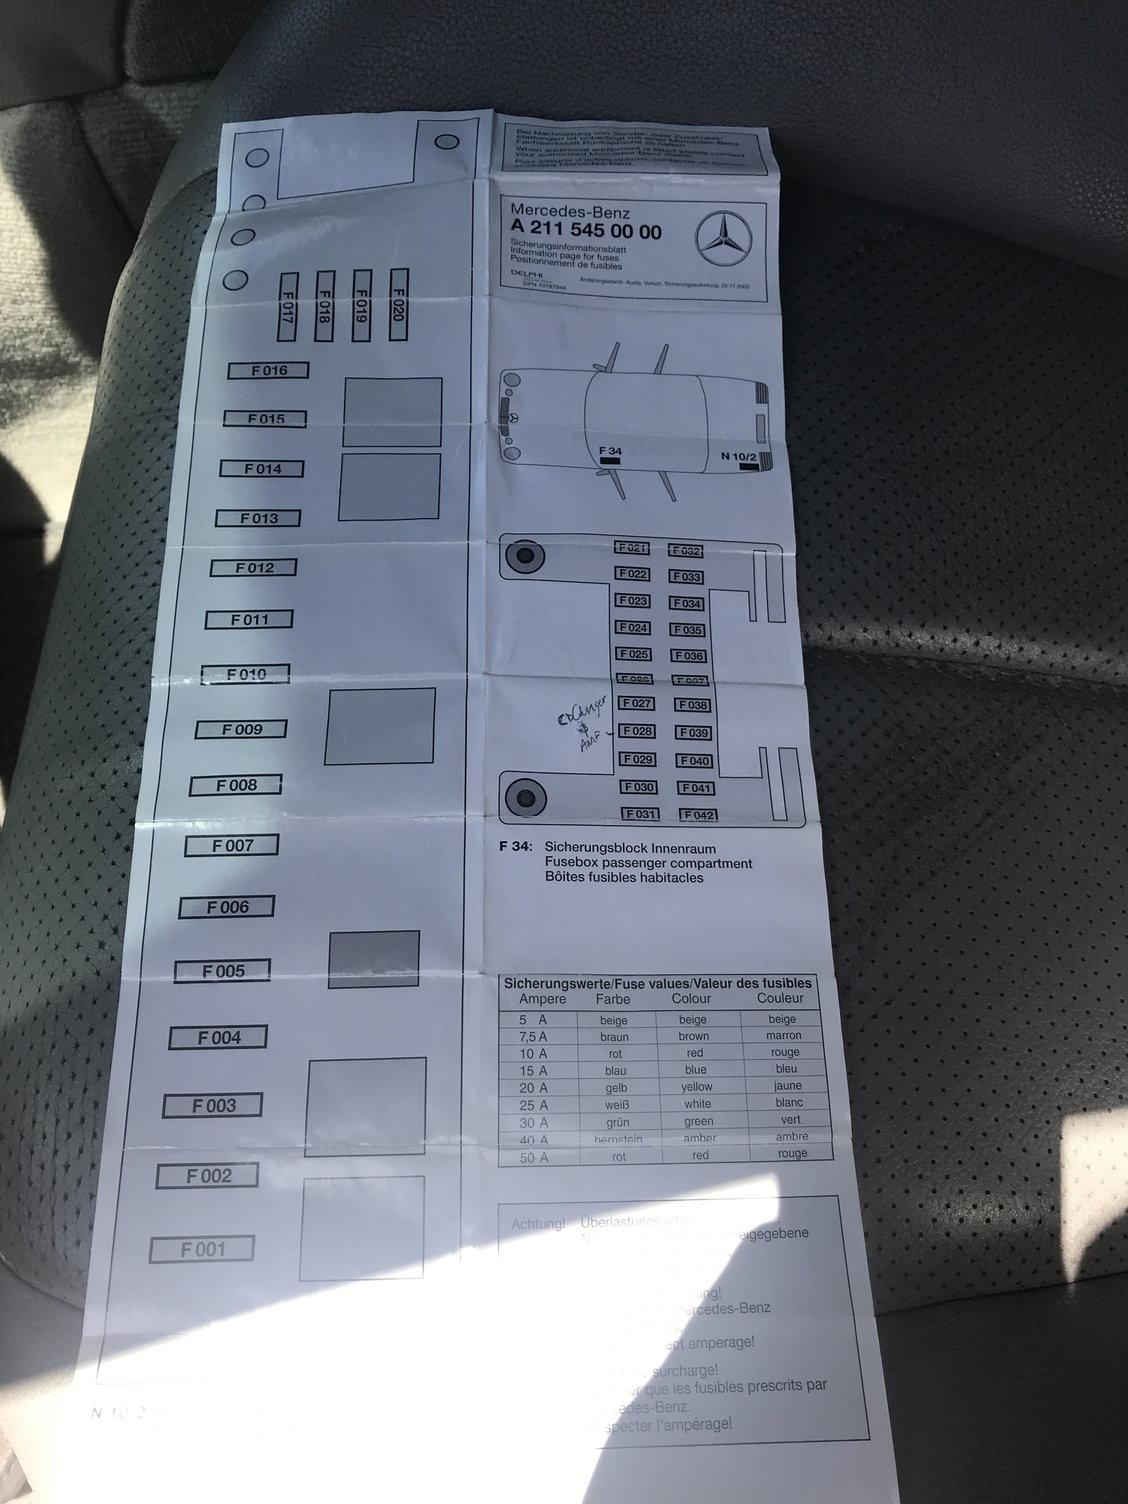 2007 Ml320 Cdi Fuse Diagram Content Resource Of Wiring 2000 Mercedes Box Location Diagrams Detailed Schematics Rh Drrobertryandundee Com Benz A Class